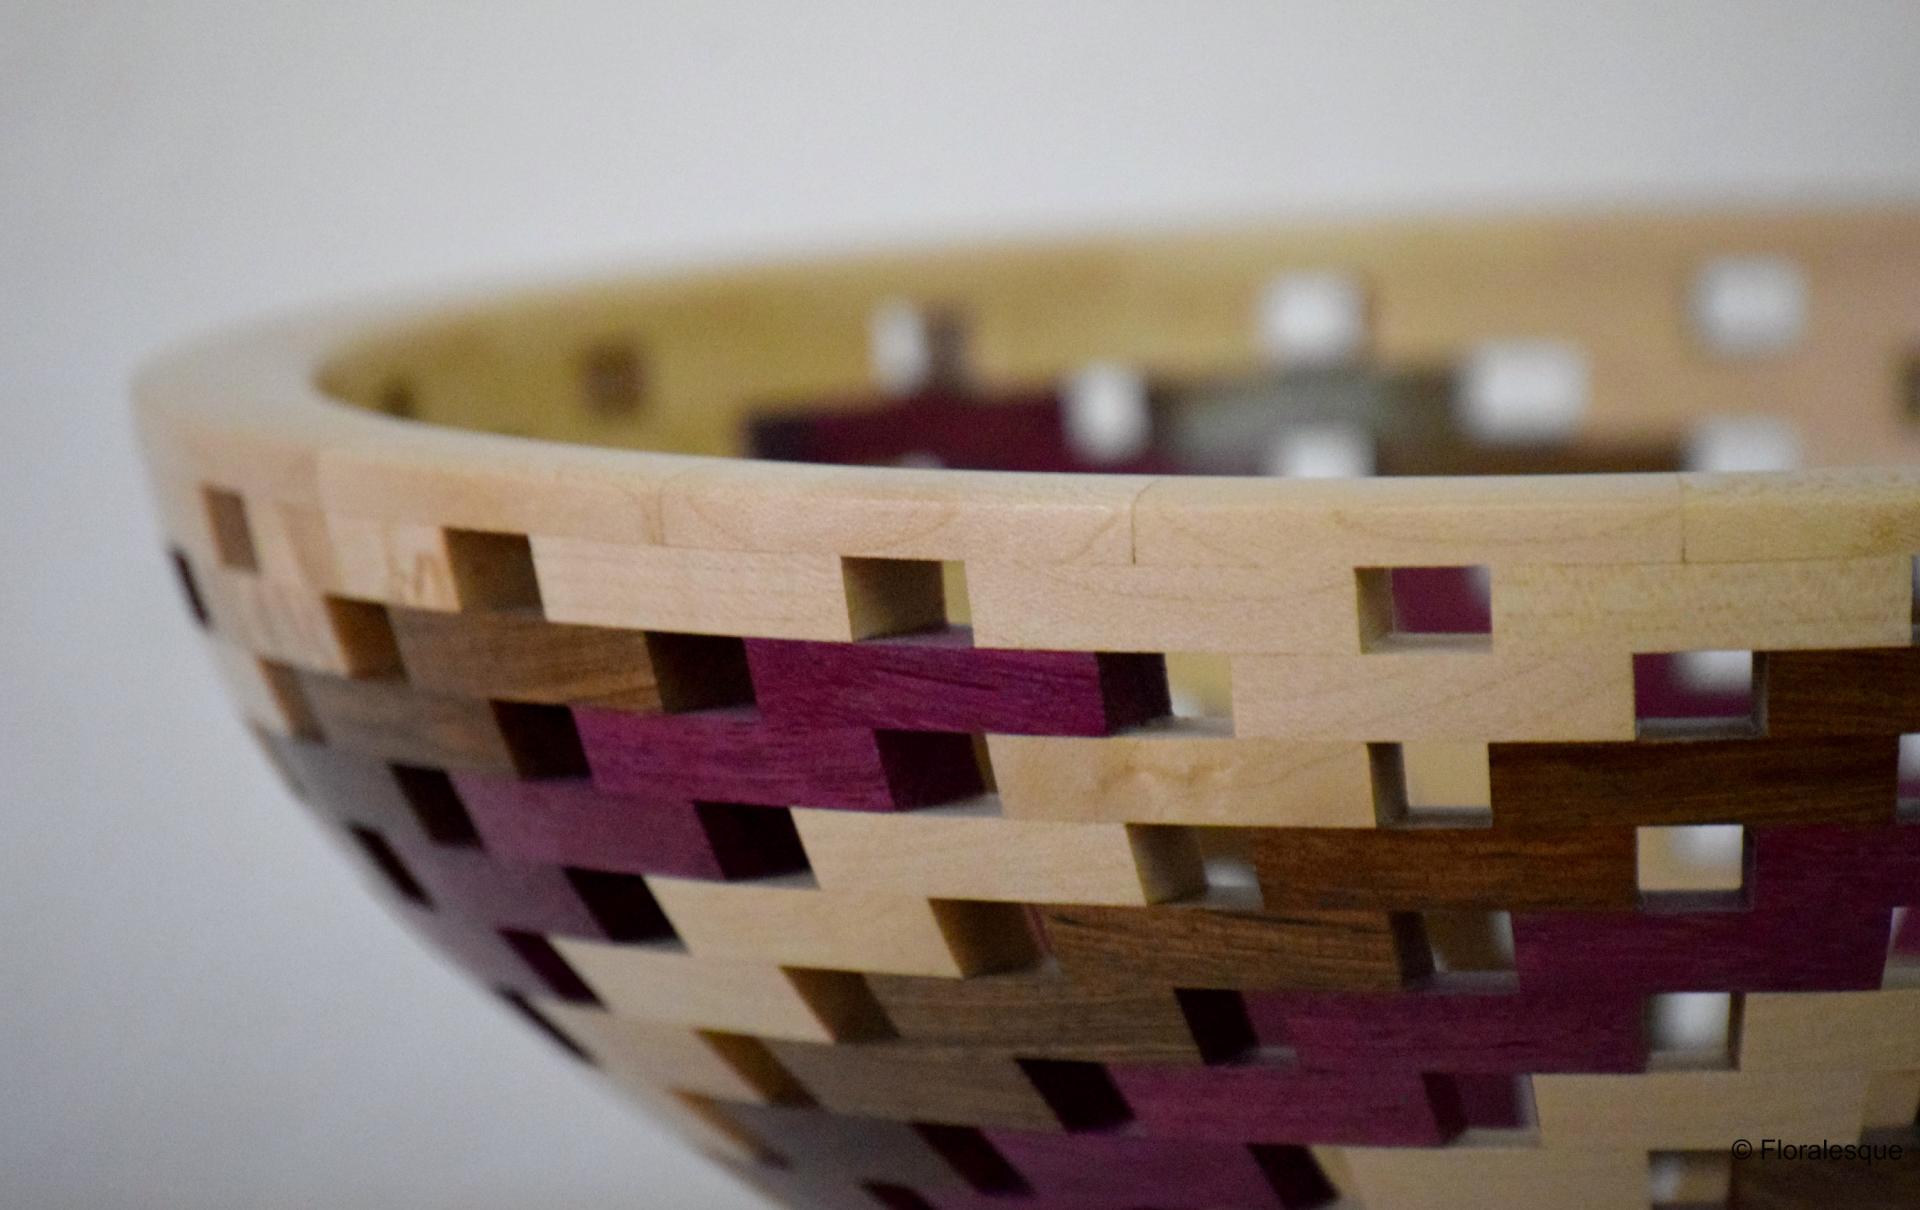 Irish Design Gift Guide - Craft & Homewear colm brennan woodturning